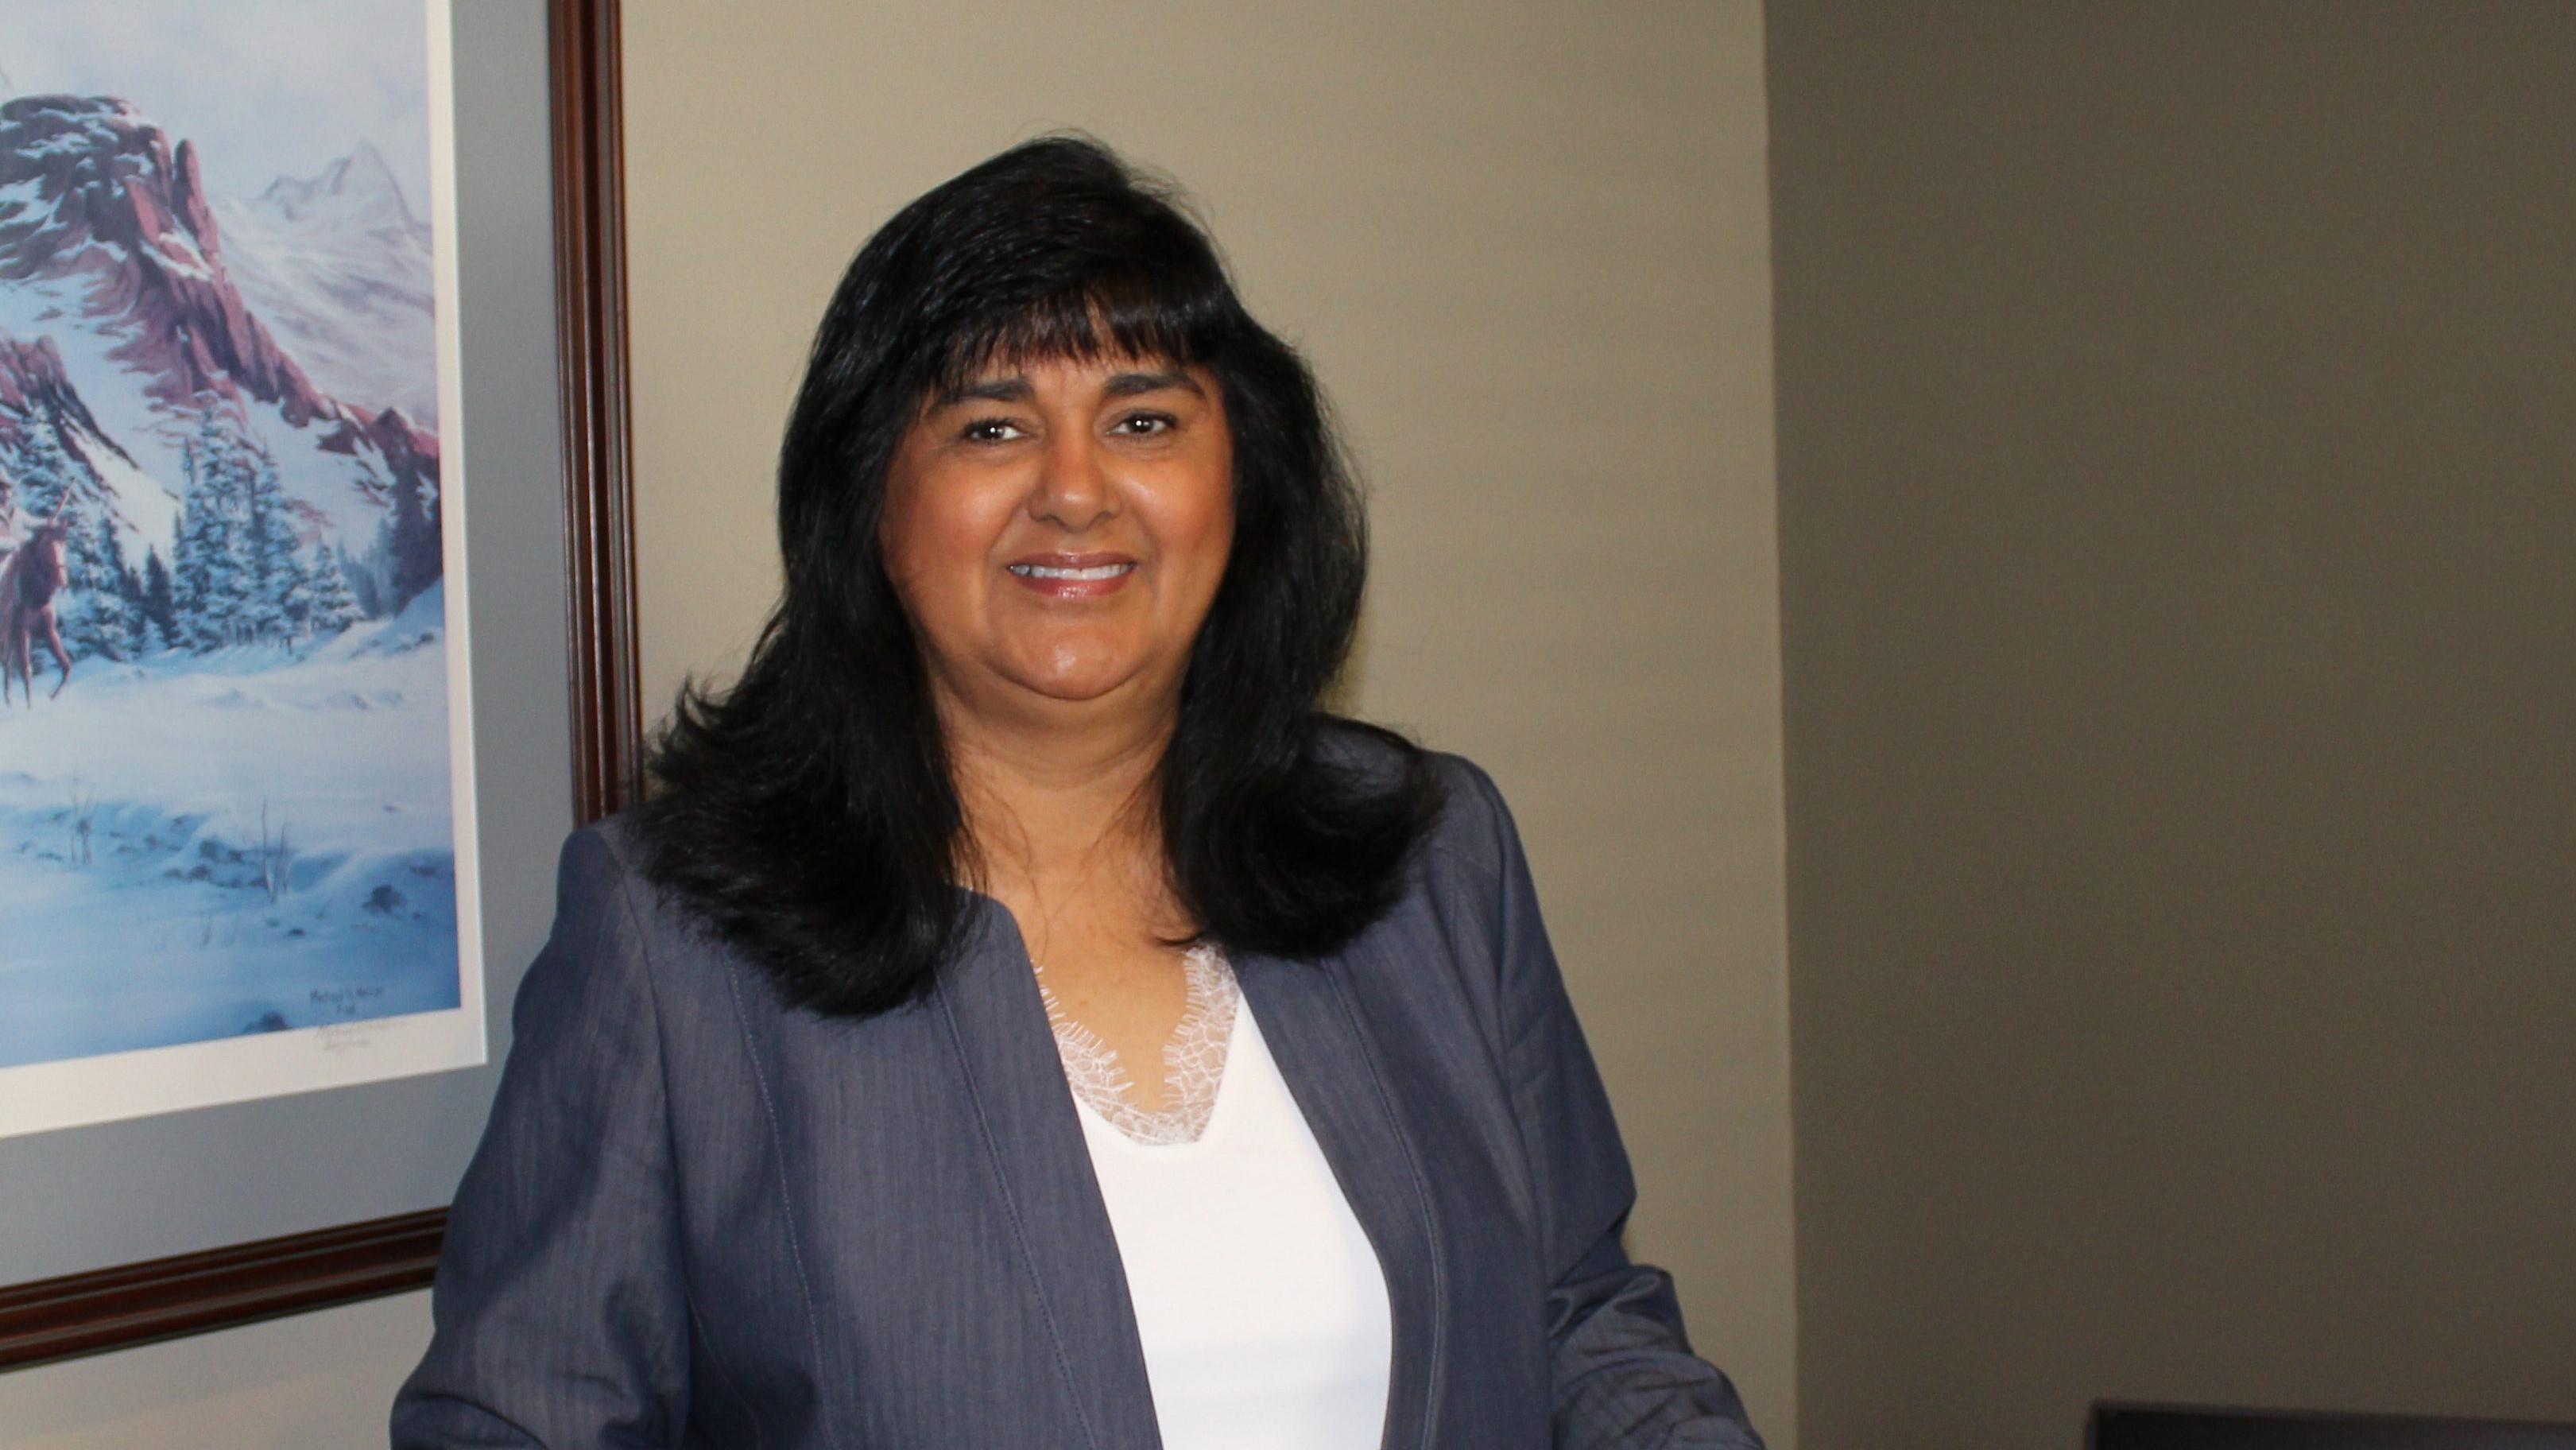 DK Security Grand Rapids Business Journal Sindia Narber